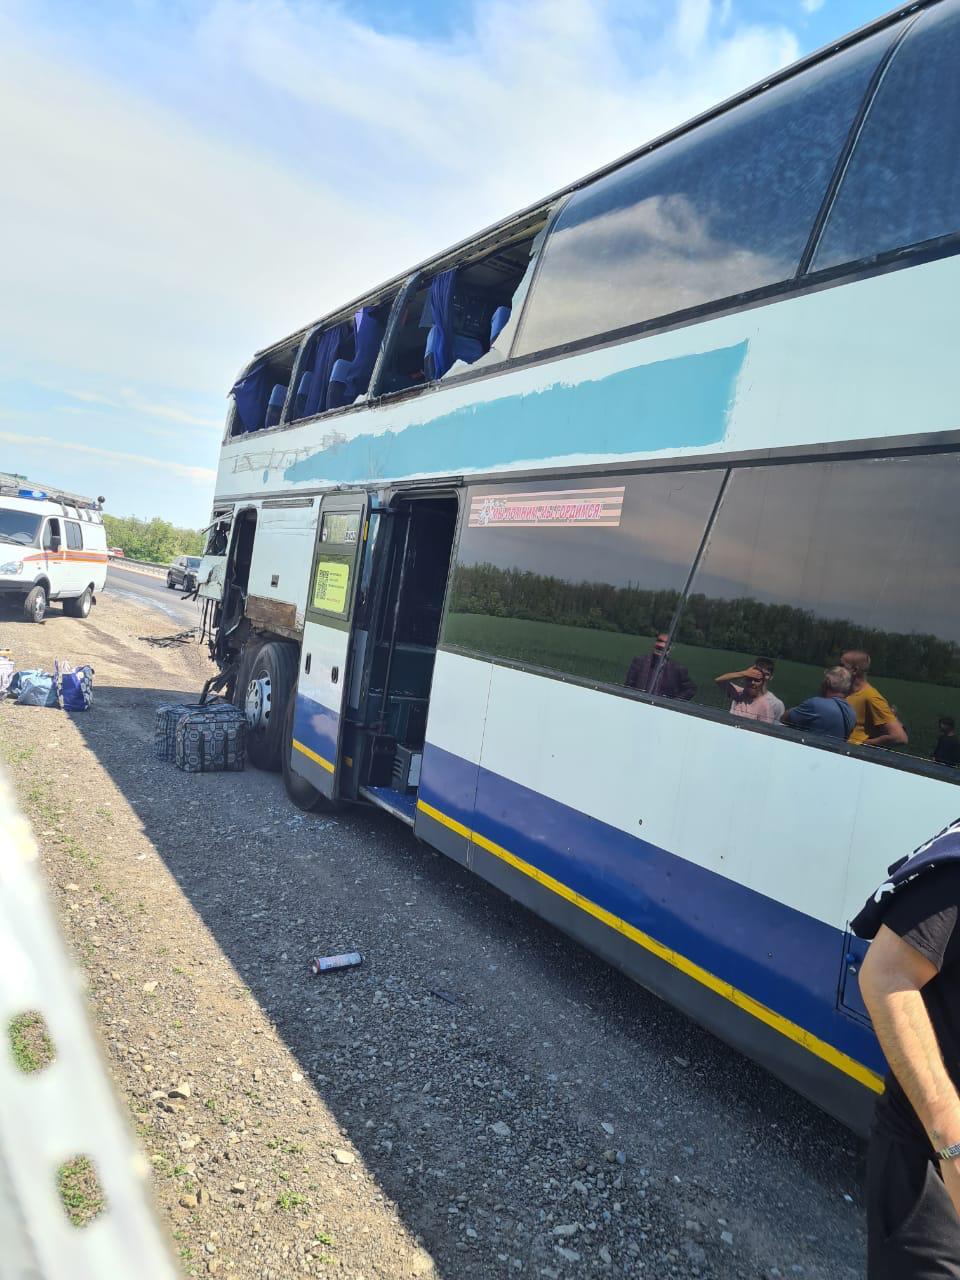 После гибели пассажира автобуса на М-4 «Дон» прокуратура начала проверку